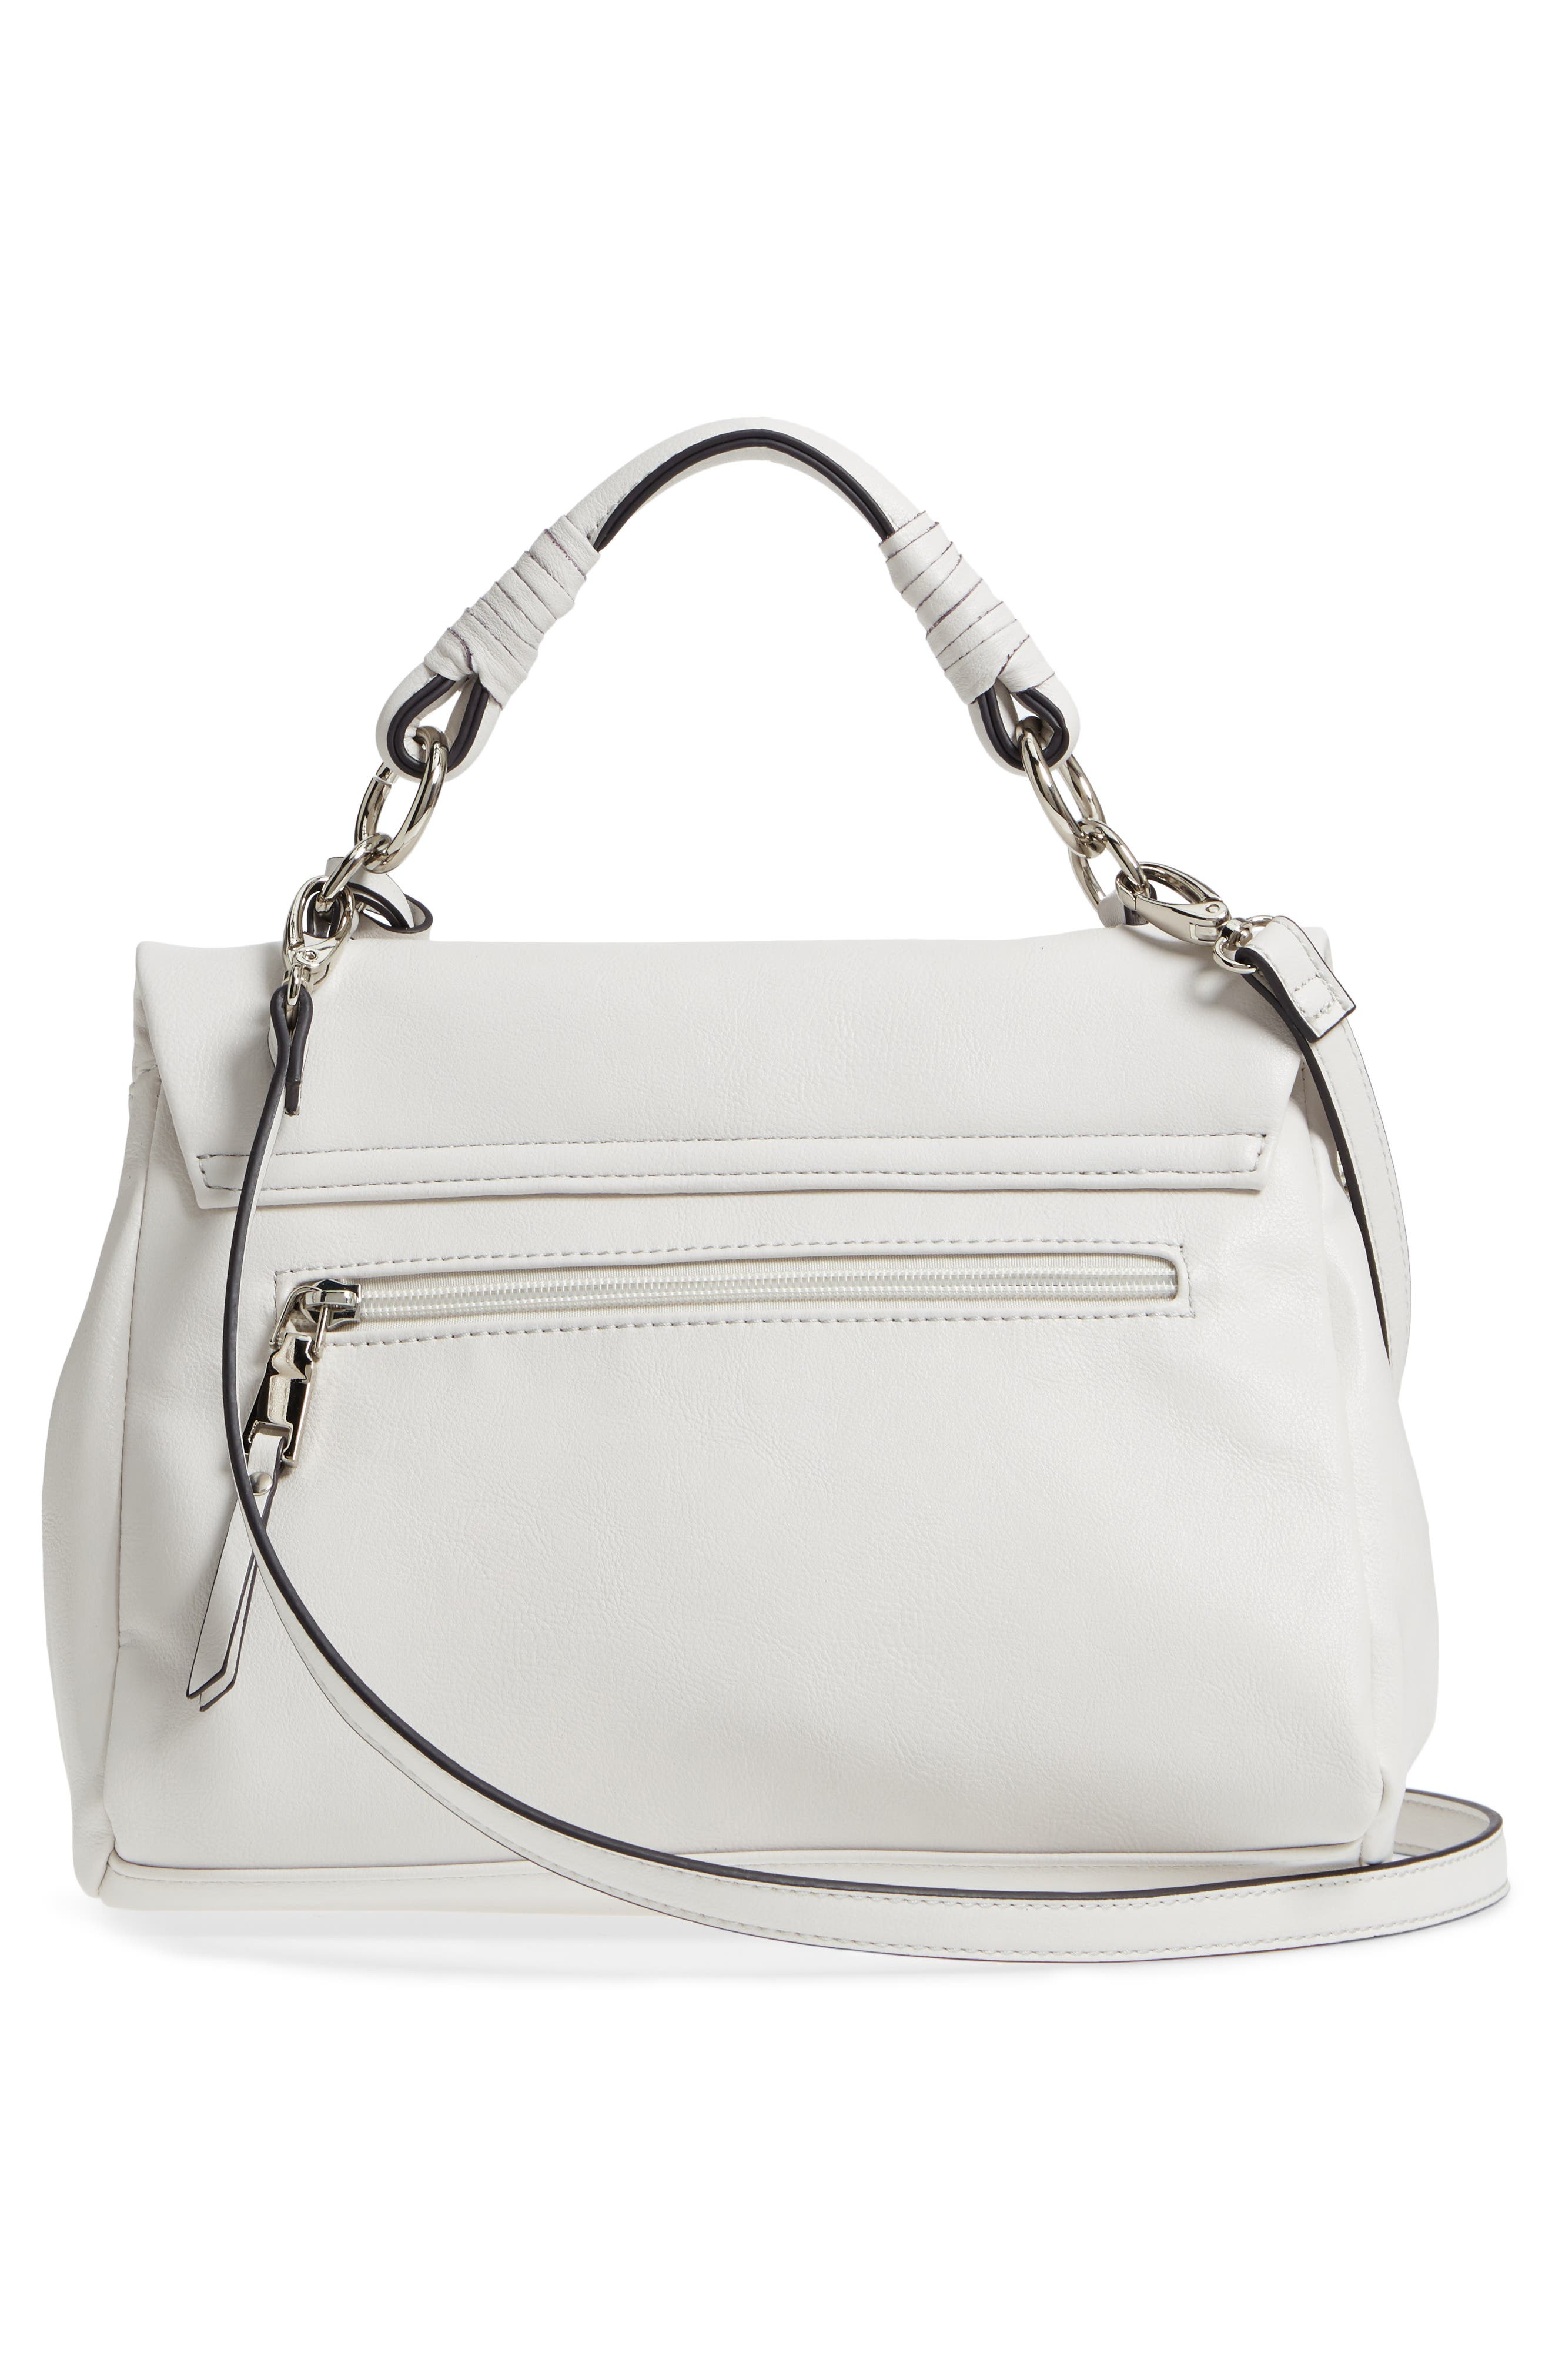 Top Handle Faux Leather Crossbody Bag,                             Alternate thumbnail 3, color,                             101